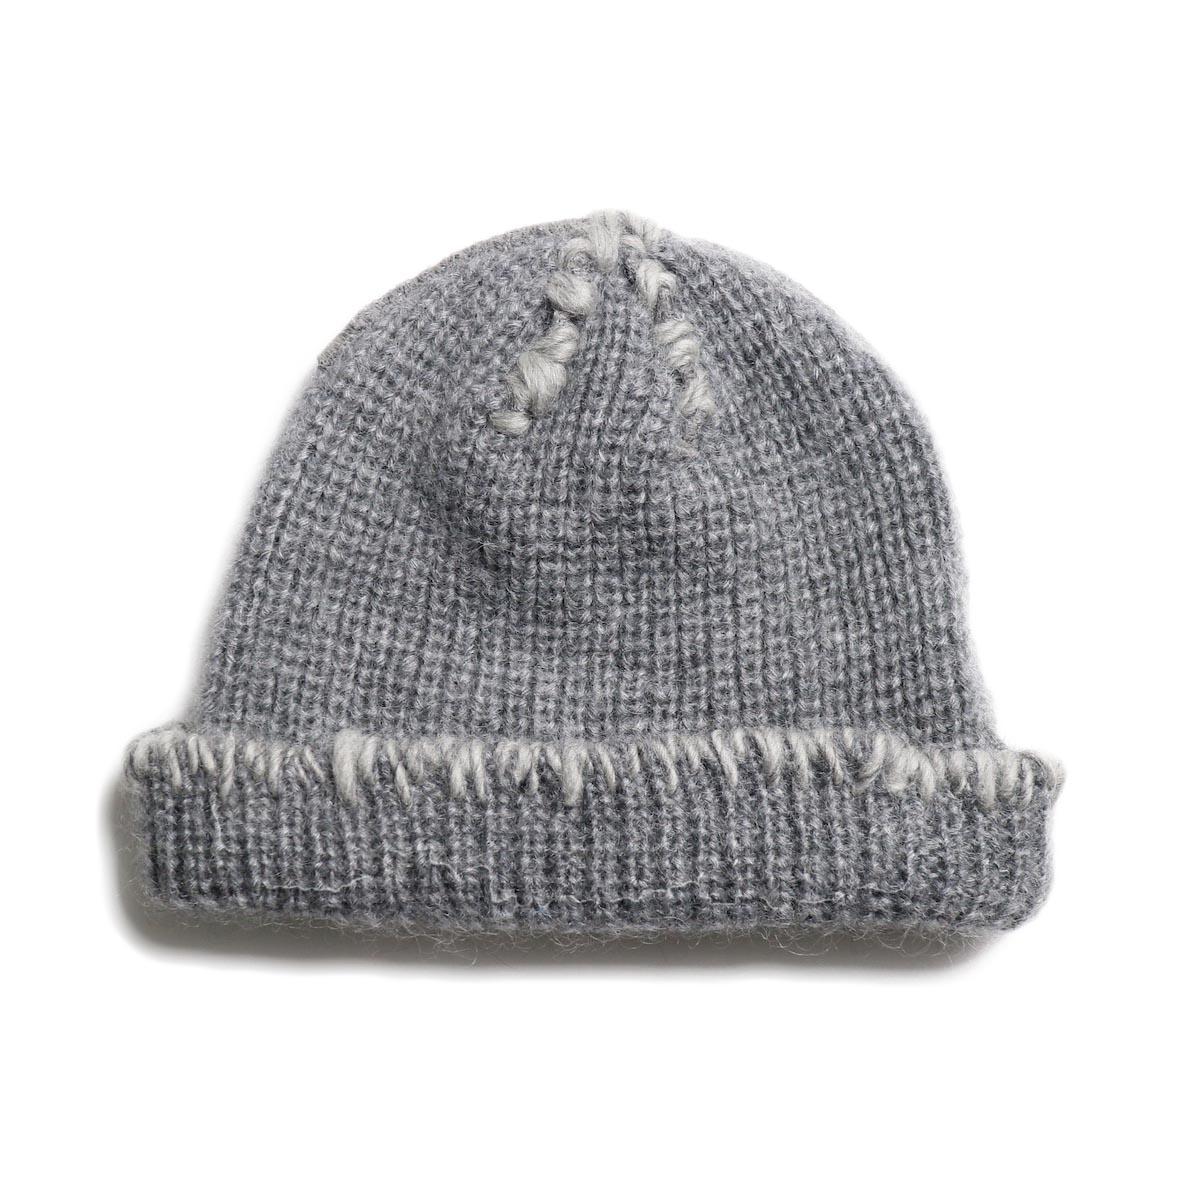 KIJIMA TAKAYUKI / Damage Knit Cap (KN182909) GRAY 正面